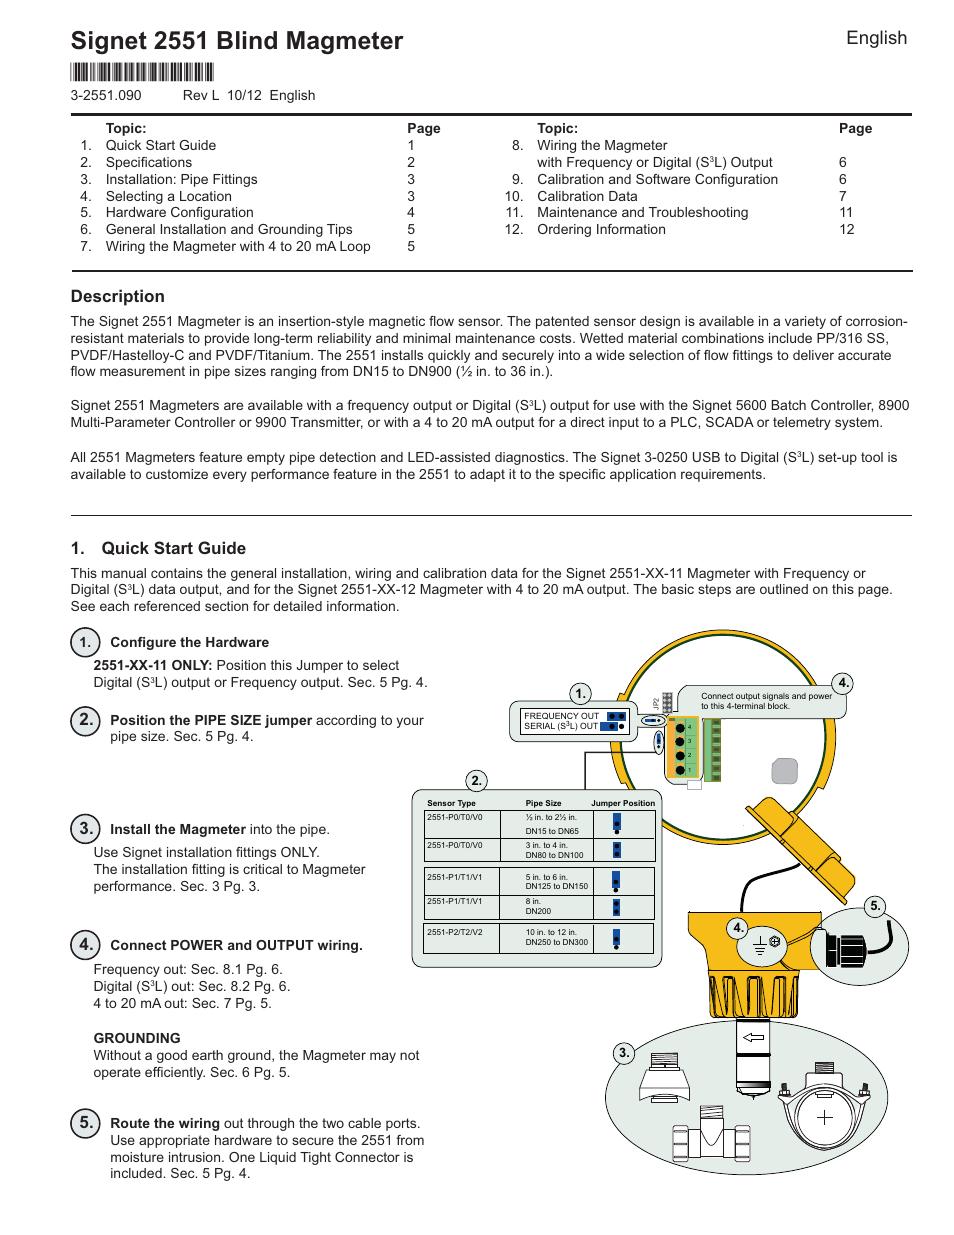 gf signet 2551 magmeter flow sensor blind user manual t1 wiring diagram pdf t1 wiring digital #6